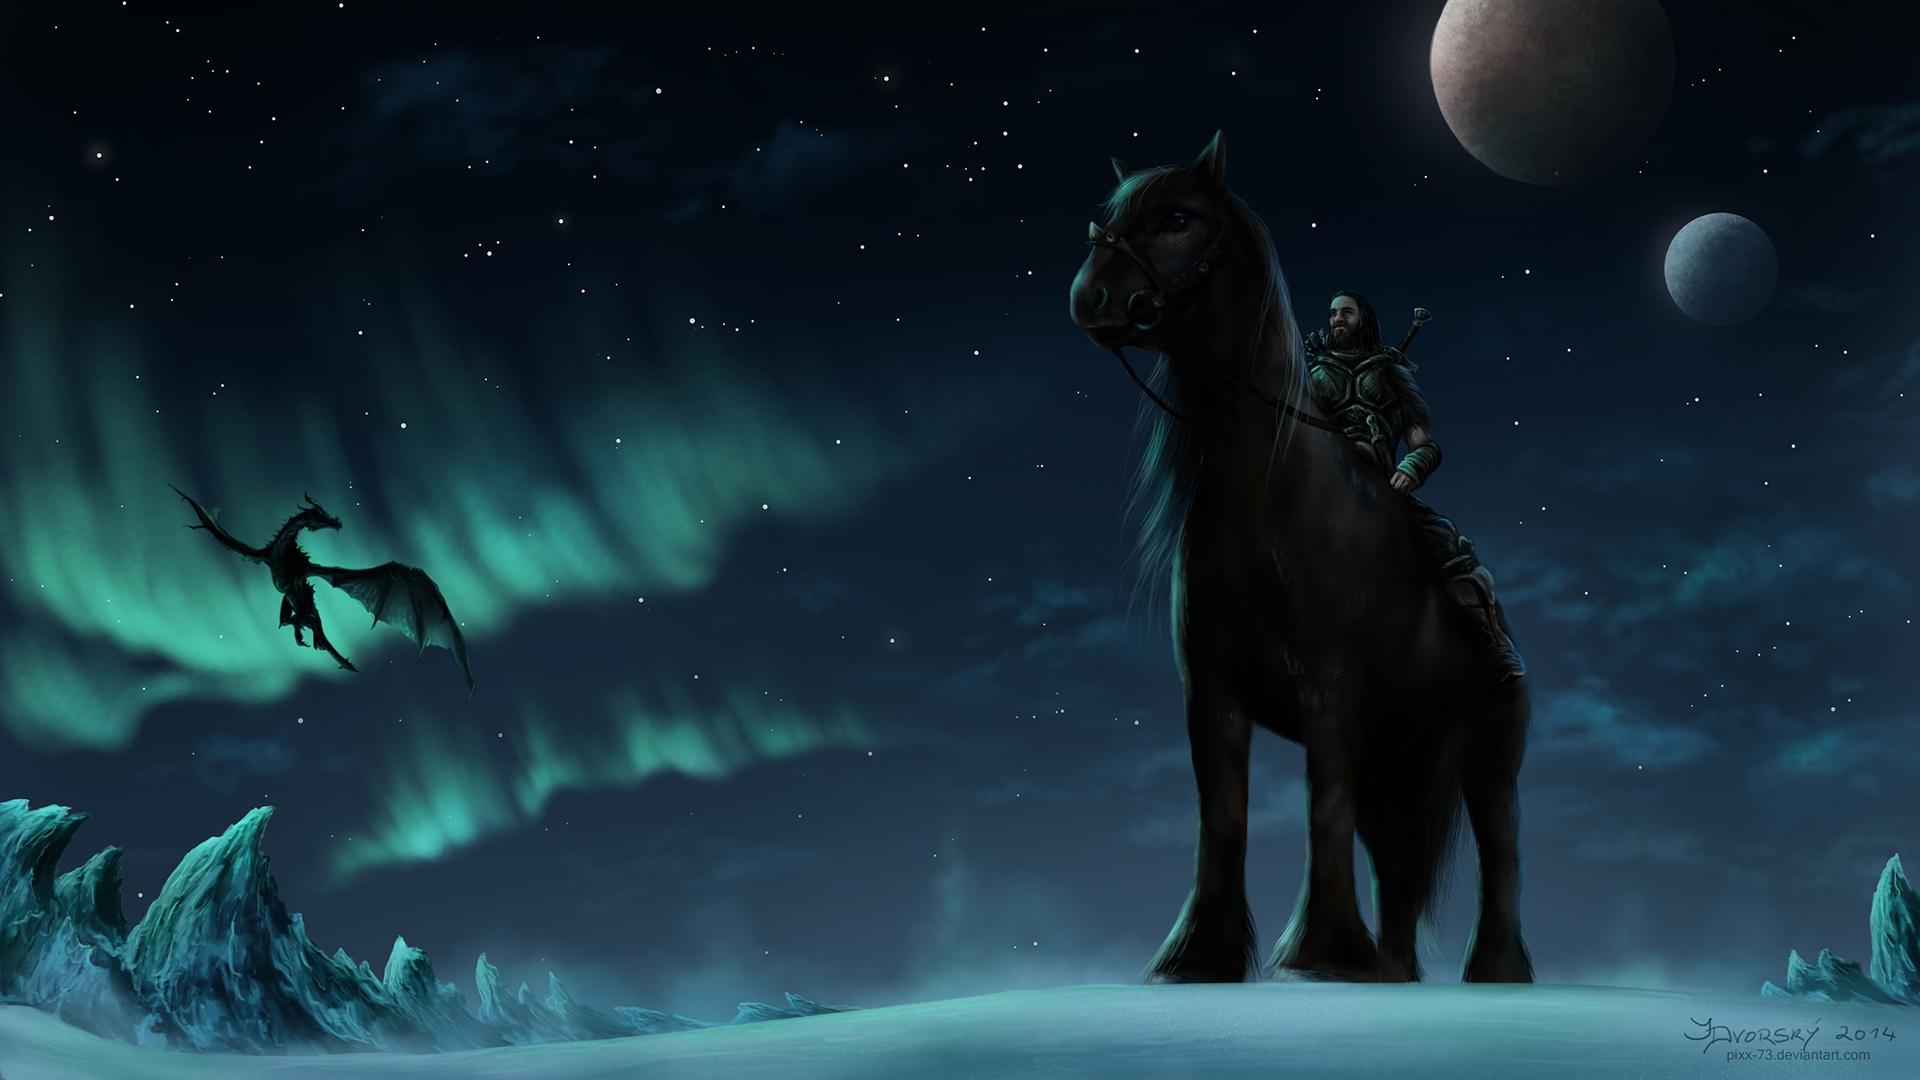 Nights in Skyrim by Pixx-73